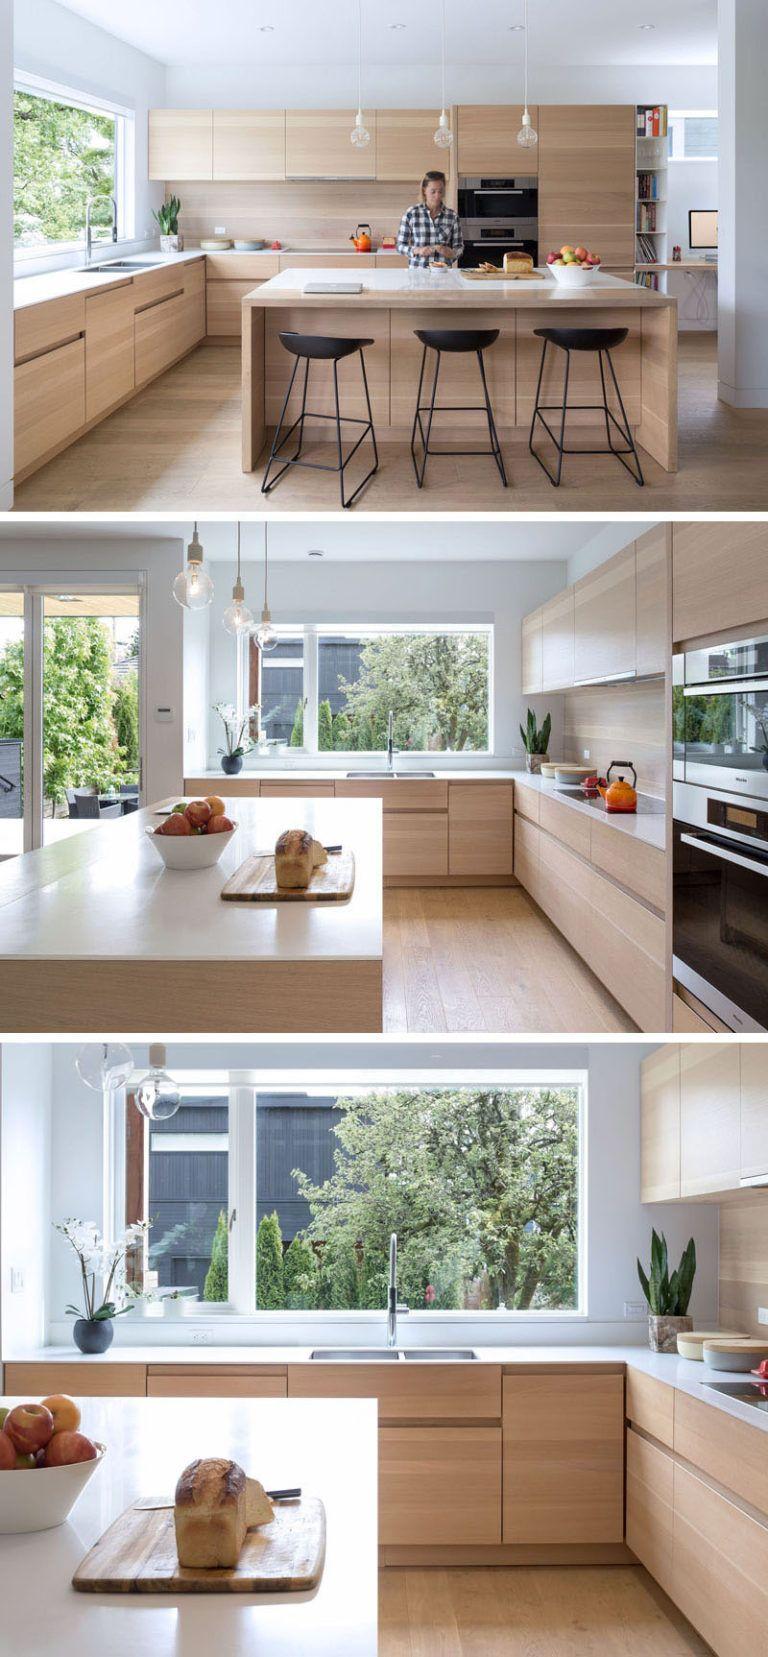 Idee Per La Cucina a mid-block contemporary home arrives in vancouver | design